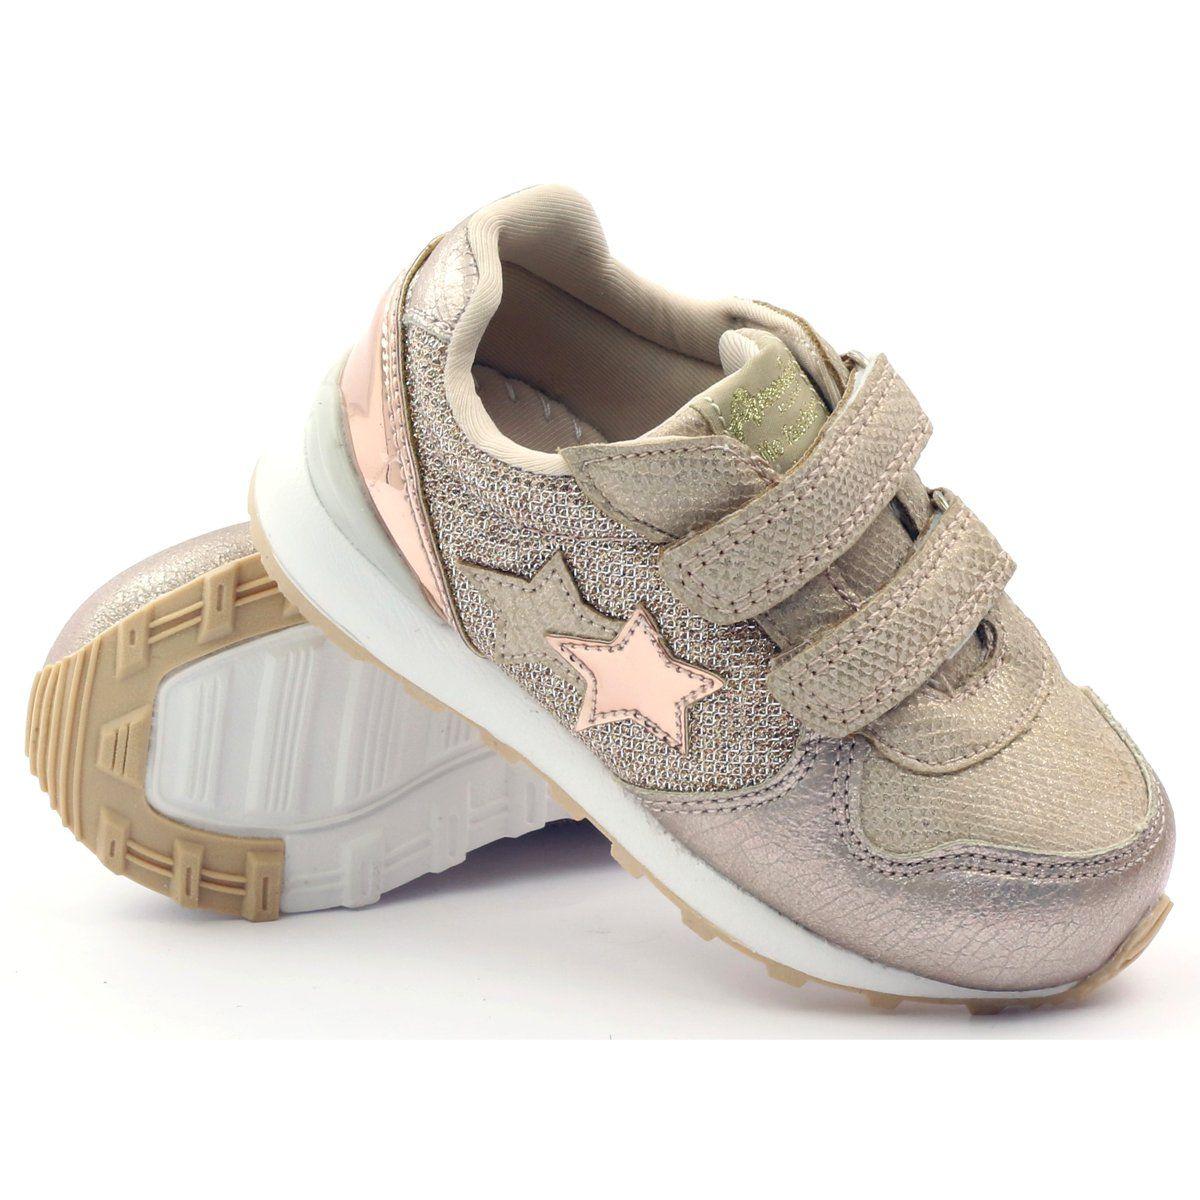 American Club Buty Sportowe Trampki American 17355 Zolte Baby Shoes Kids Shoes Shoes